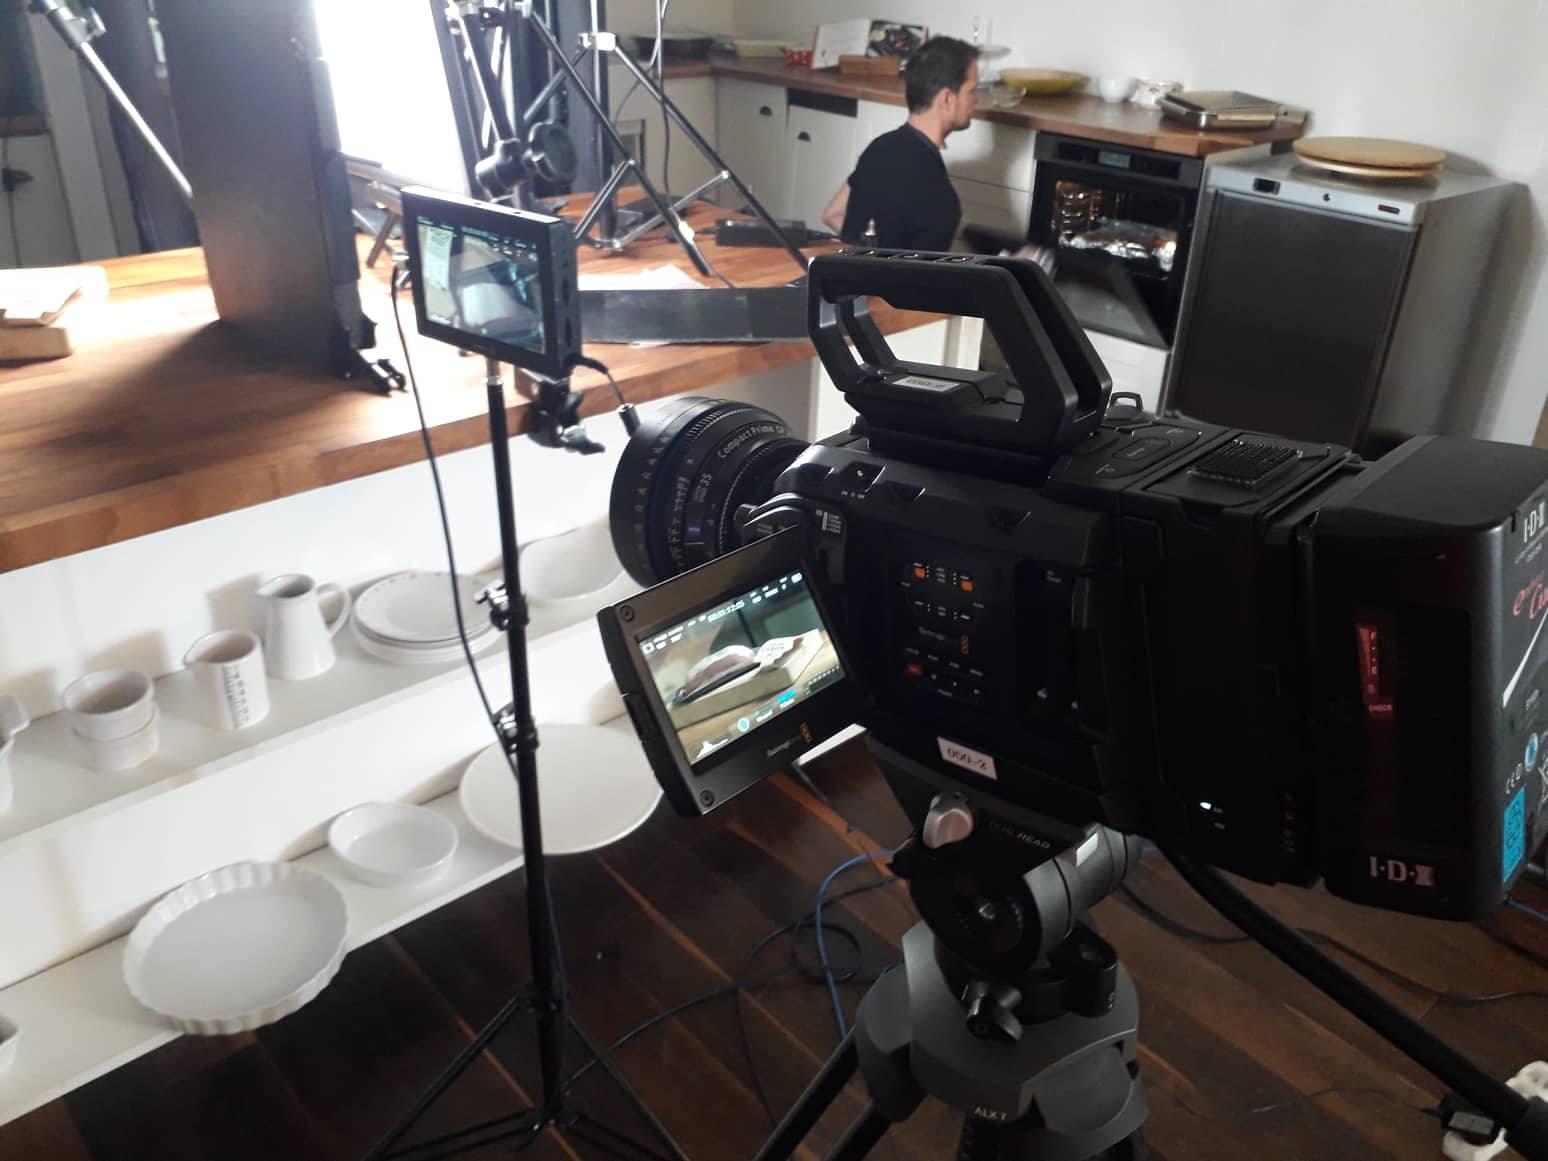 acomware-kostelecke-uzeniny-pripadova-studie-ukazka-kamery